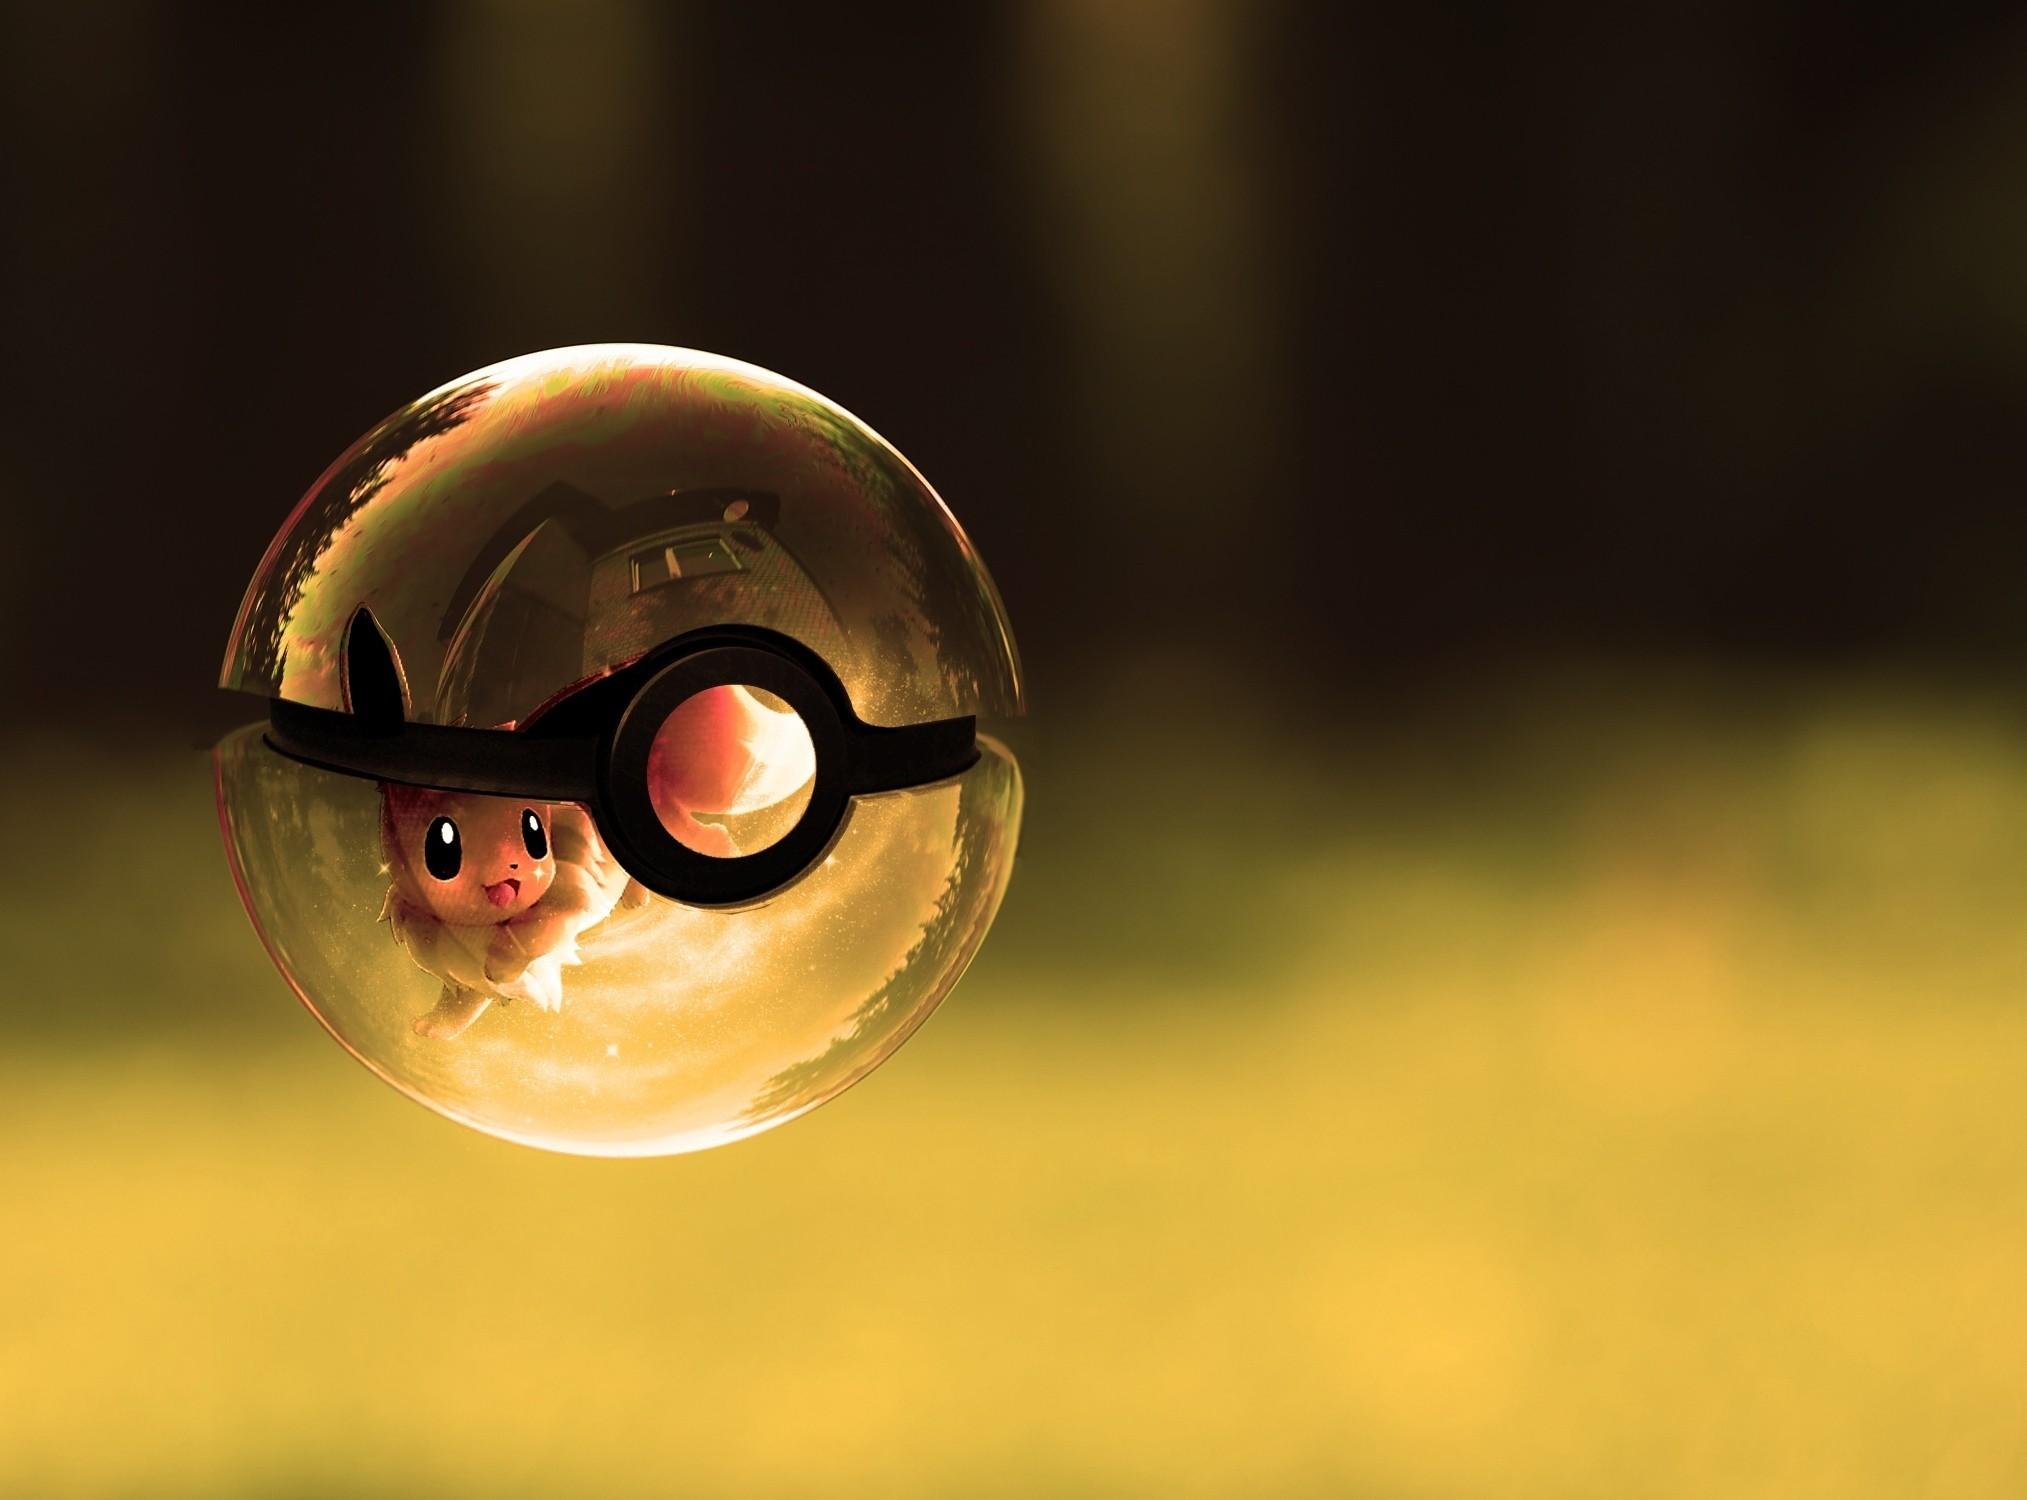 Res: 2027x1500, Charizard Dragon Duck Minecraft Pokeball Pokémon · HD Wallpaper |  Background Image ID:305896